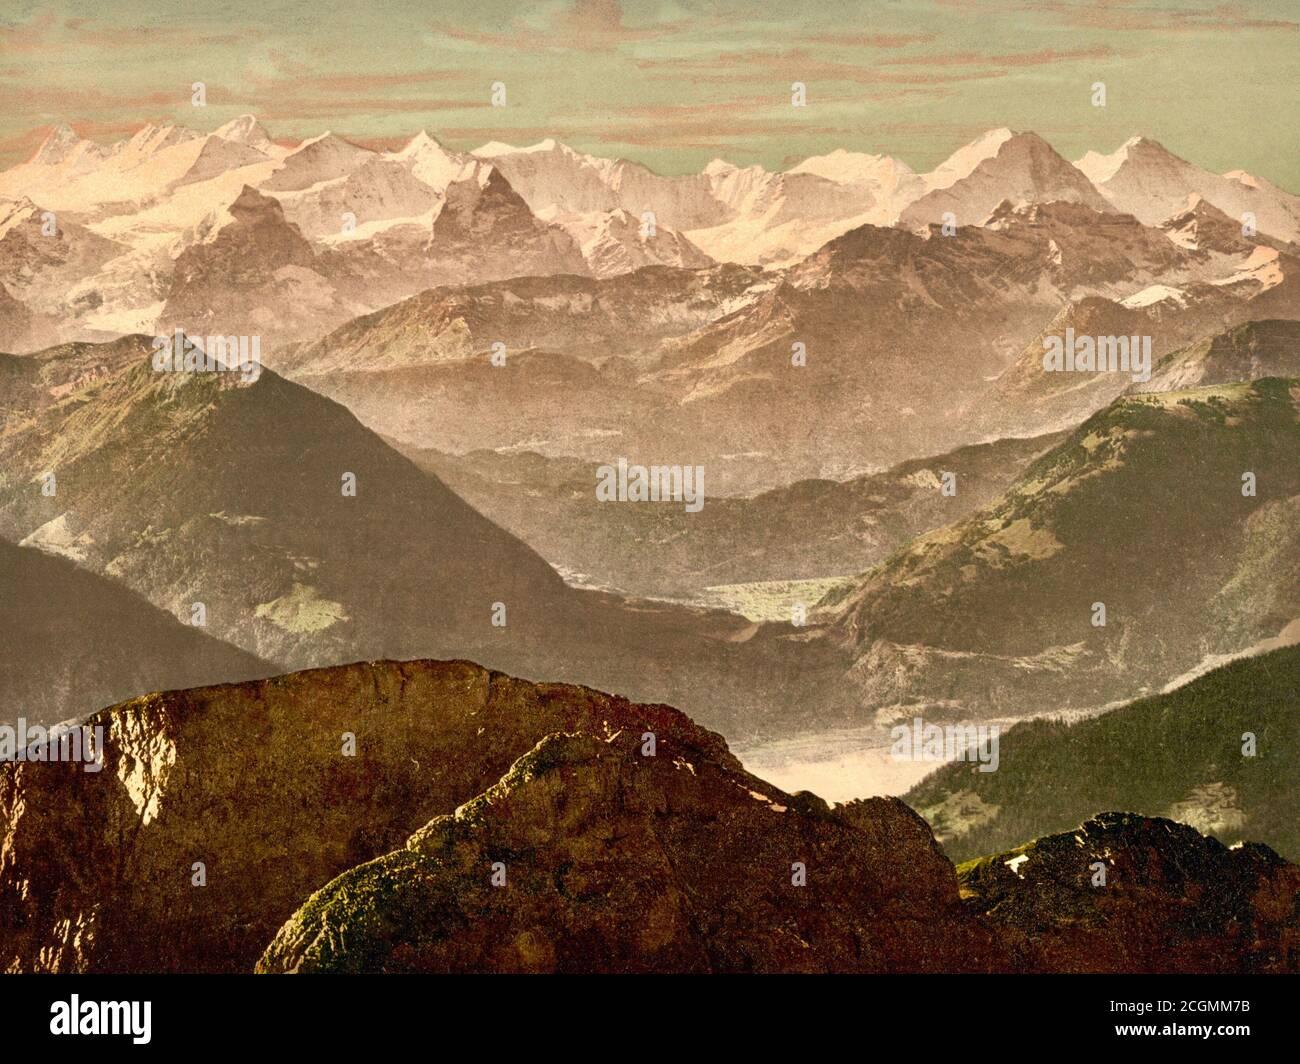 Bernese Alps from Pilatus, Bernese Oberland, Switzerland 1890. Stock Photo